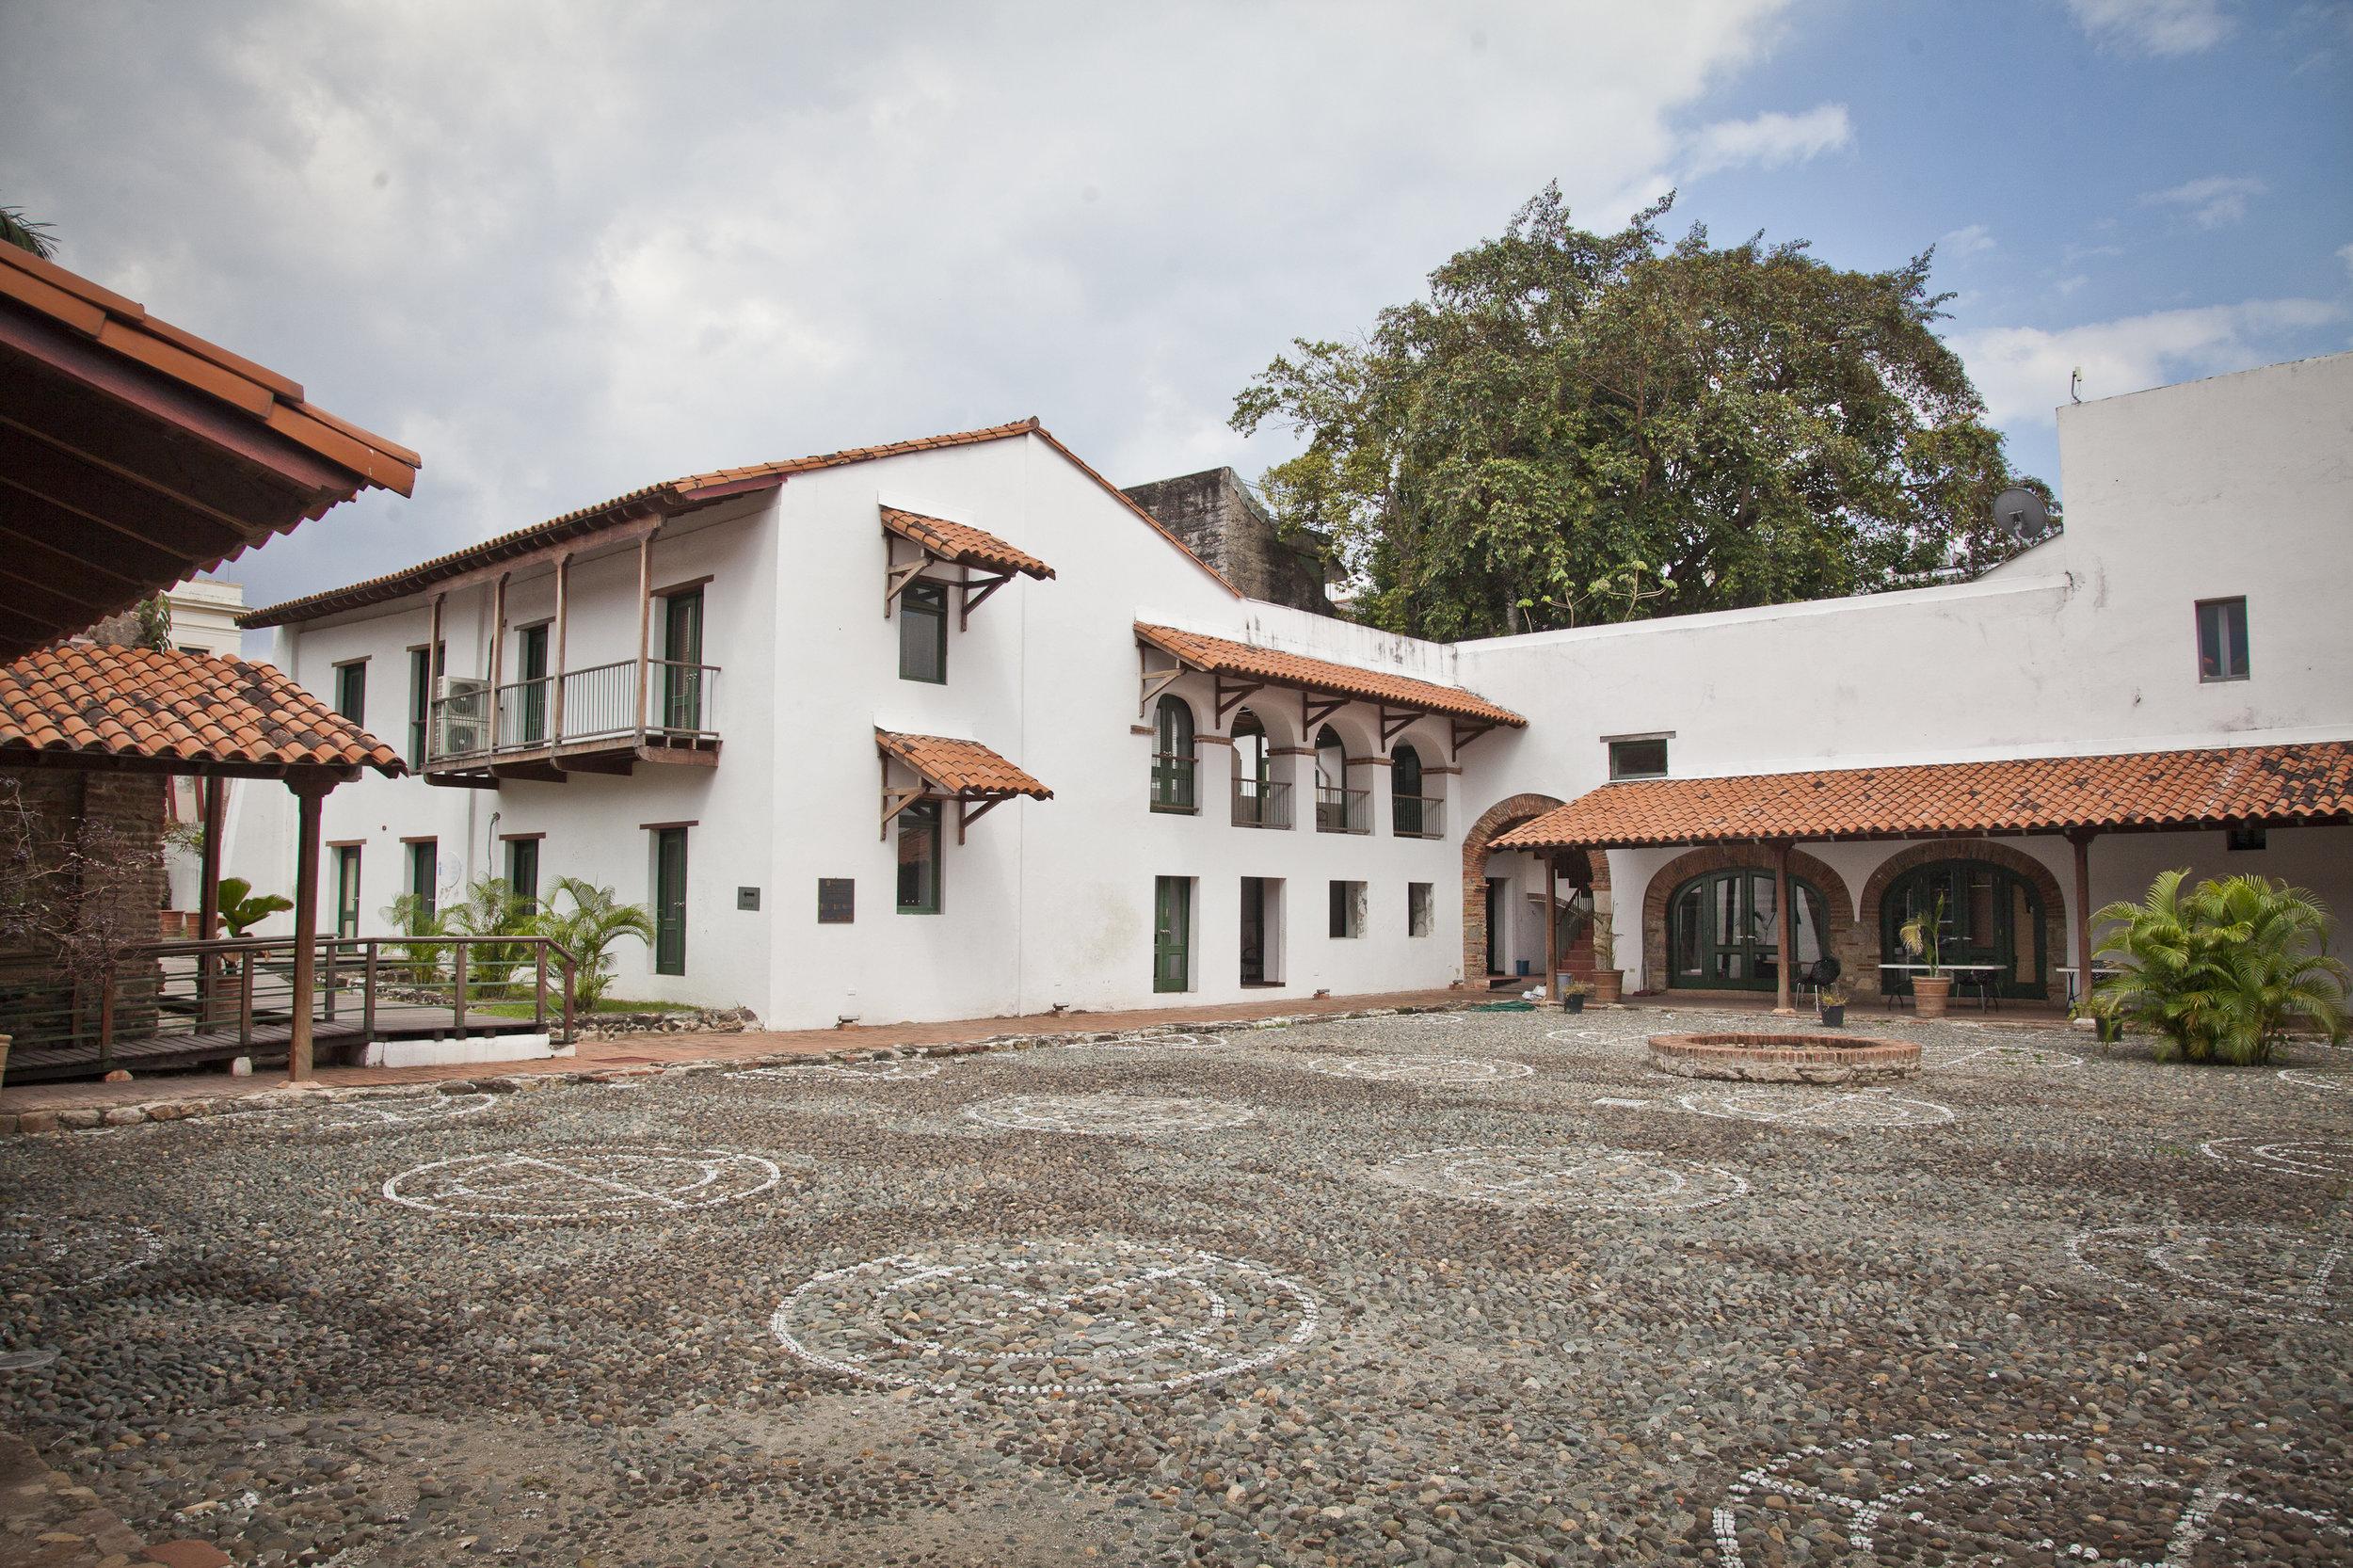 Panamá Viejo - Across the Blue Planet